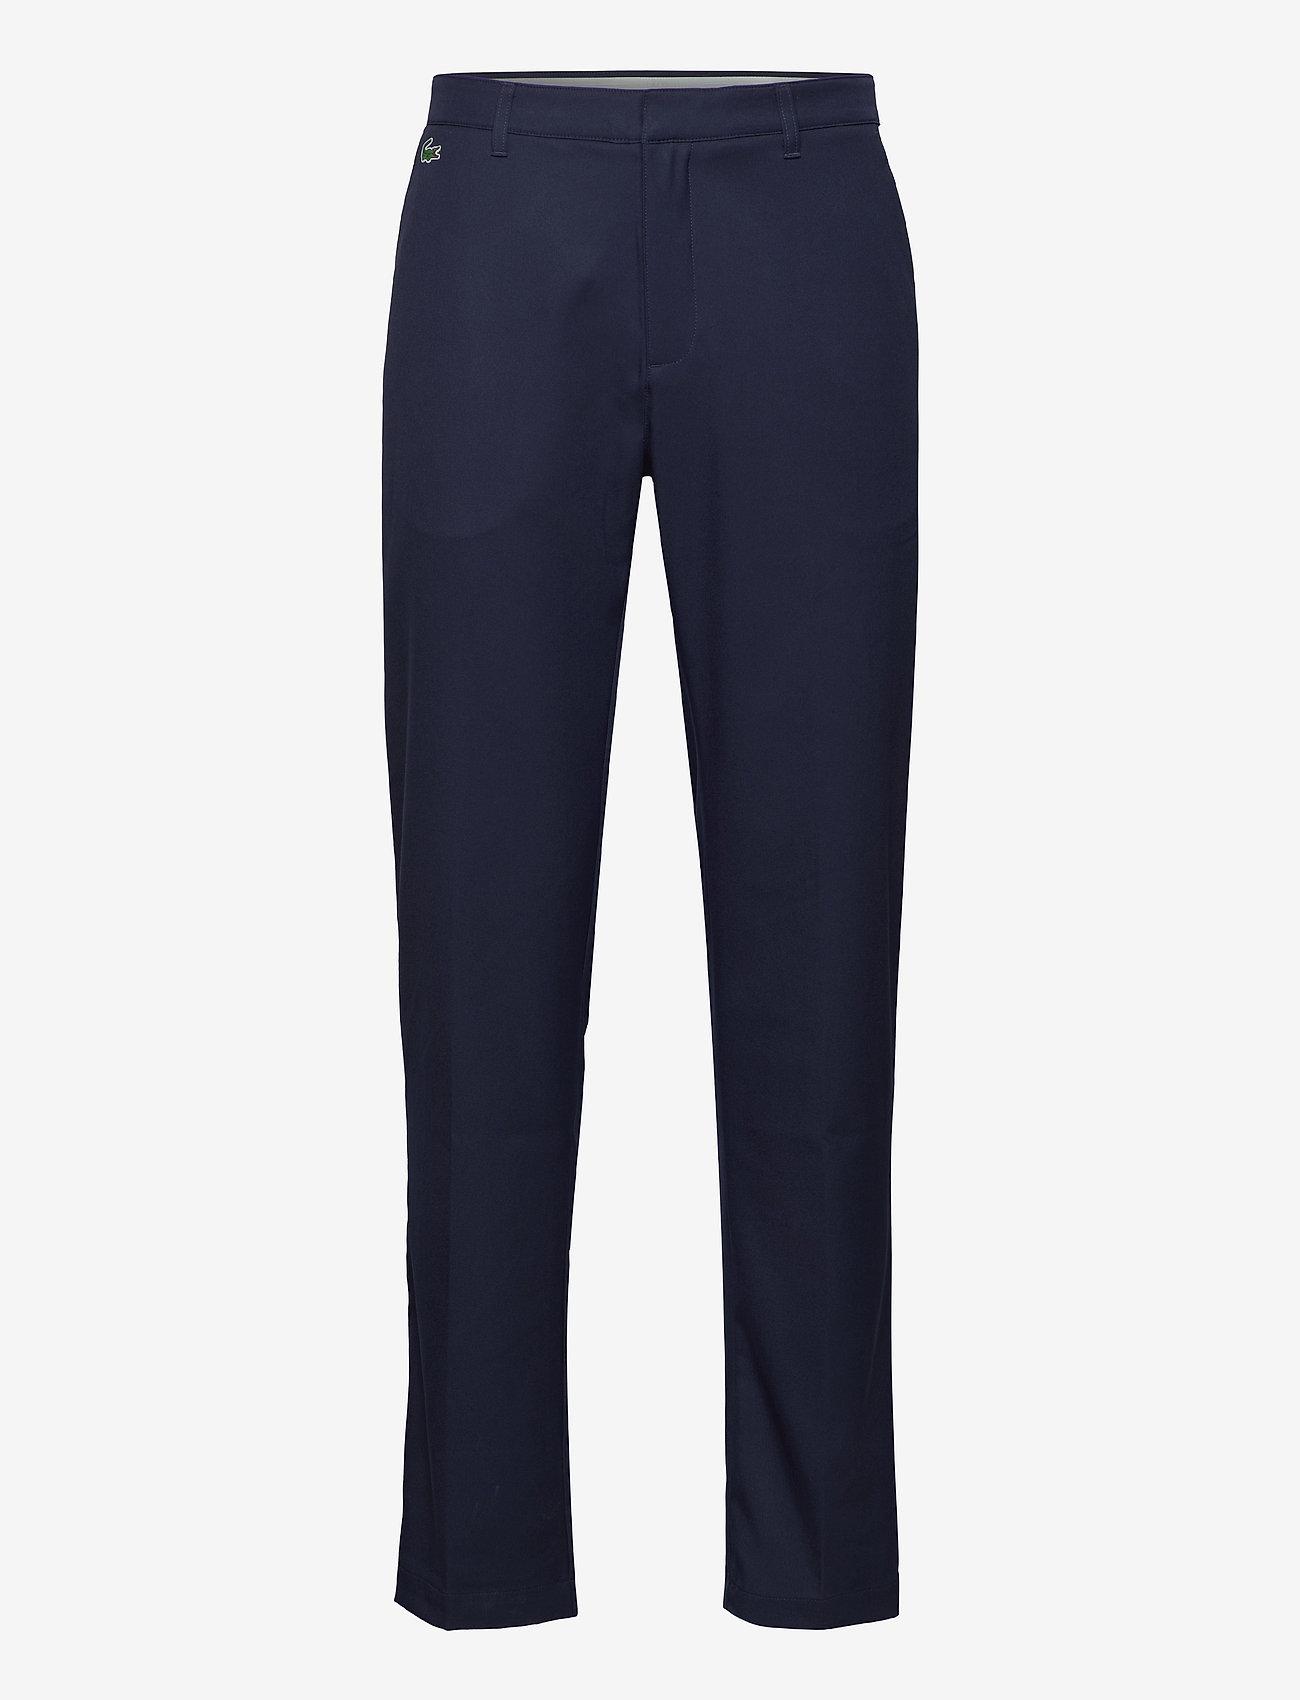 Lacoste - Men s leisure trousers - golf-housut - navy blue - 0